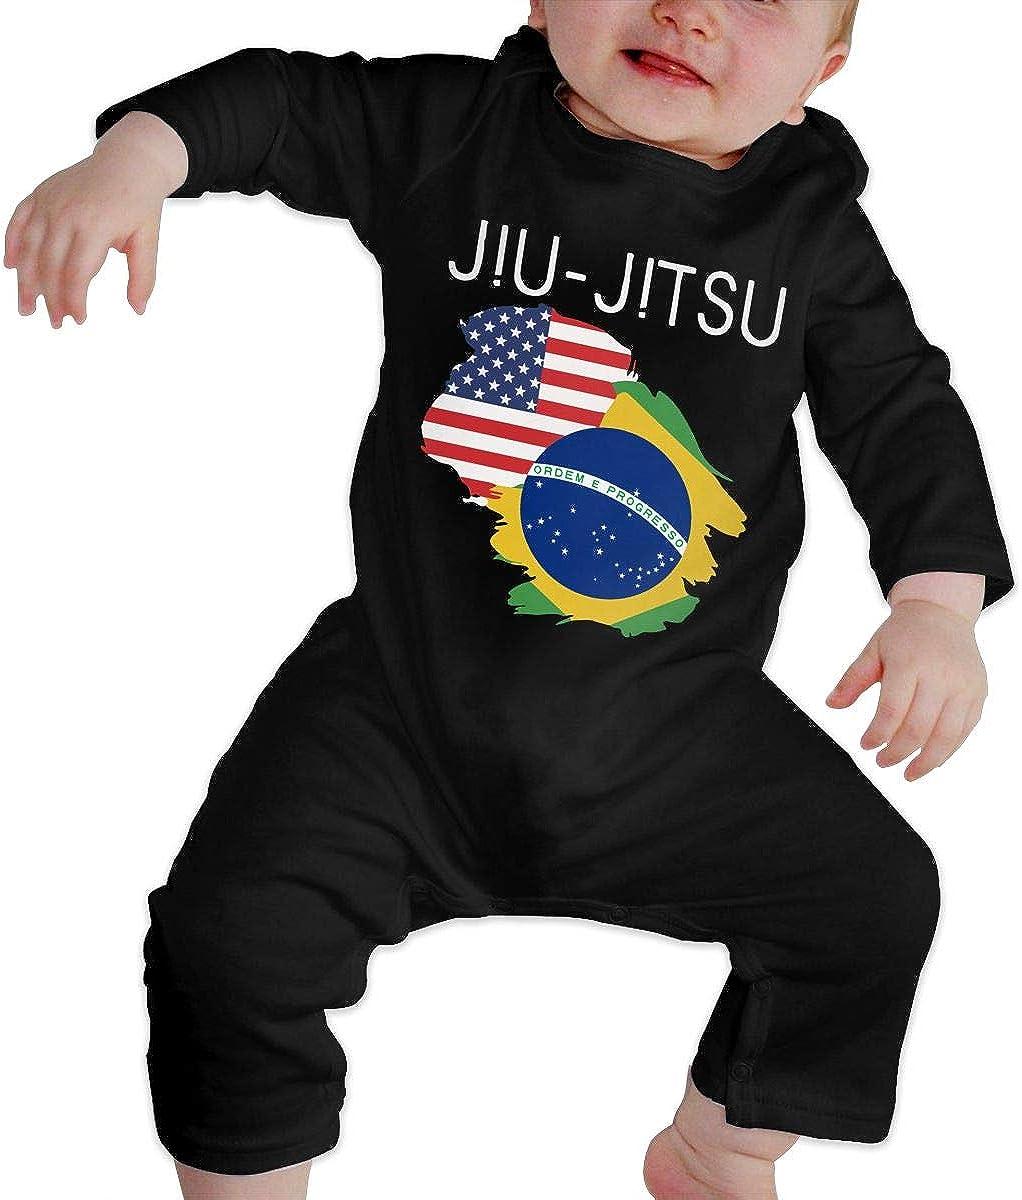 Jiu Jitsu USA Brazil Flag Organic One-Piece Bodysuits Coverall Outfits BKNGDG8Q Toddler Baby Boy Romper Jumpsuit